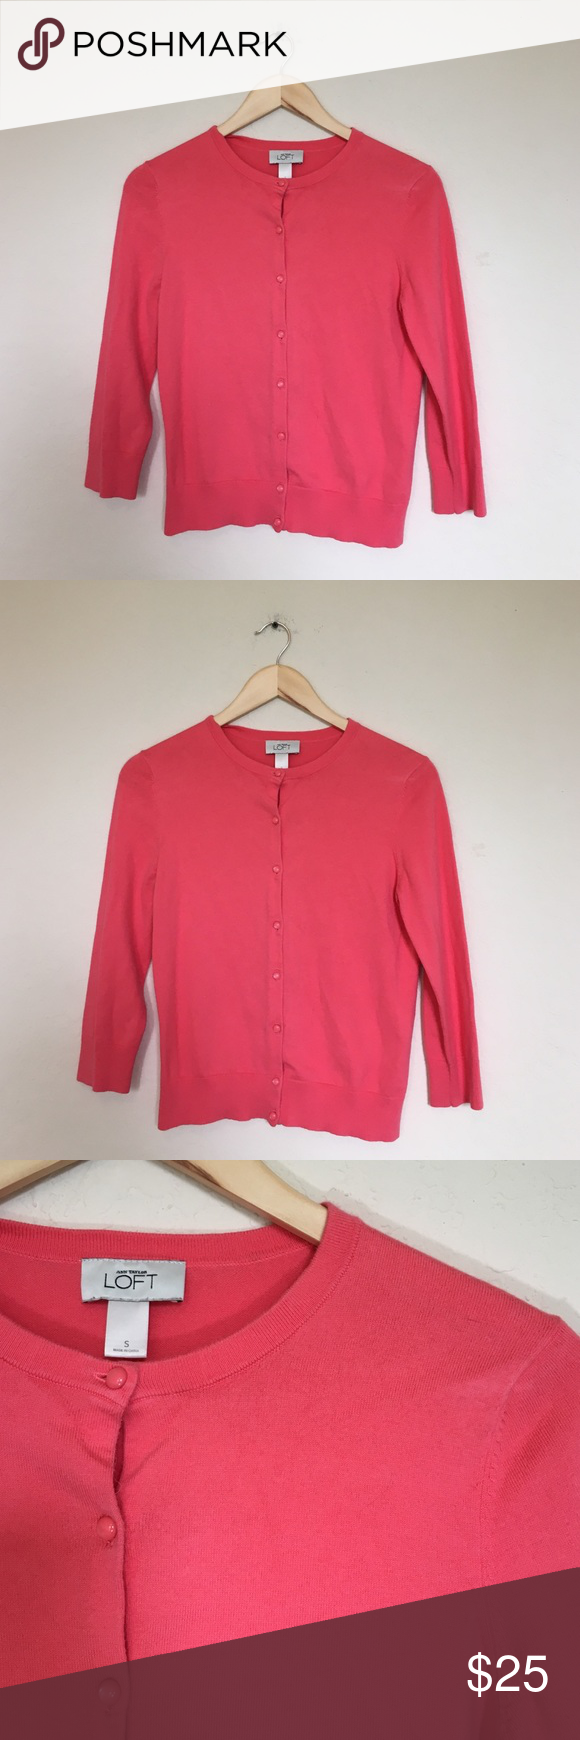 LAST CHANCE Ann Taylor Loft Coral Cardigan Sweater | Sweater ...